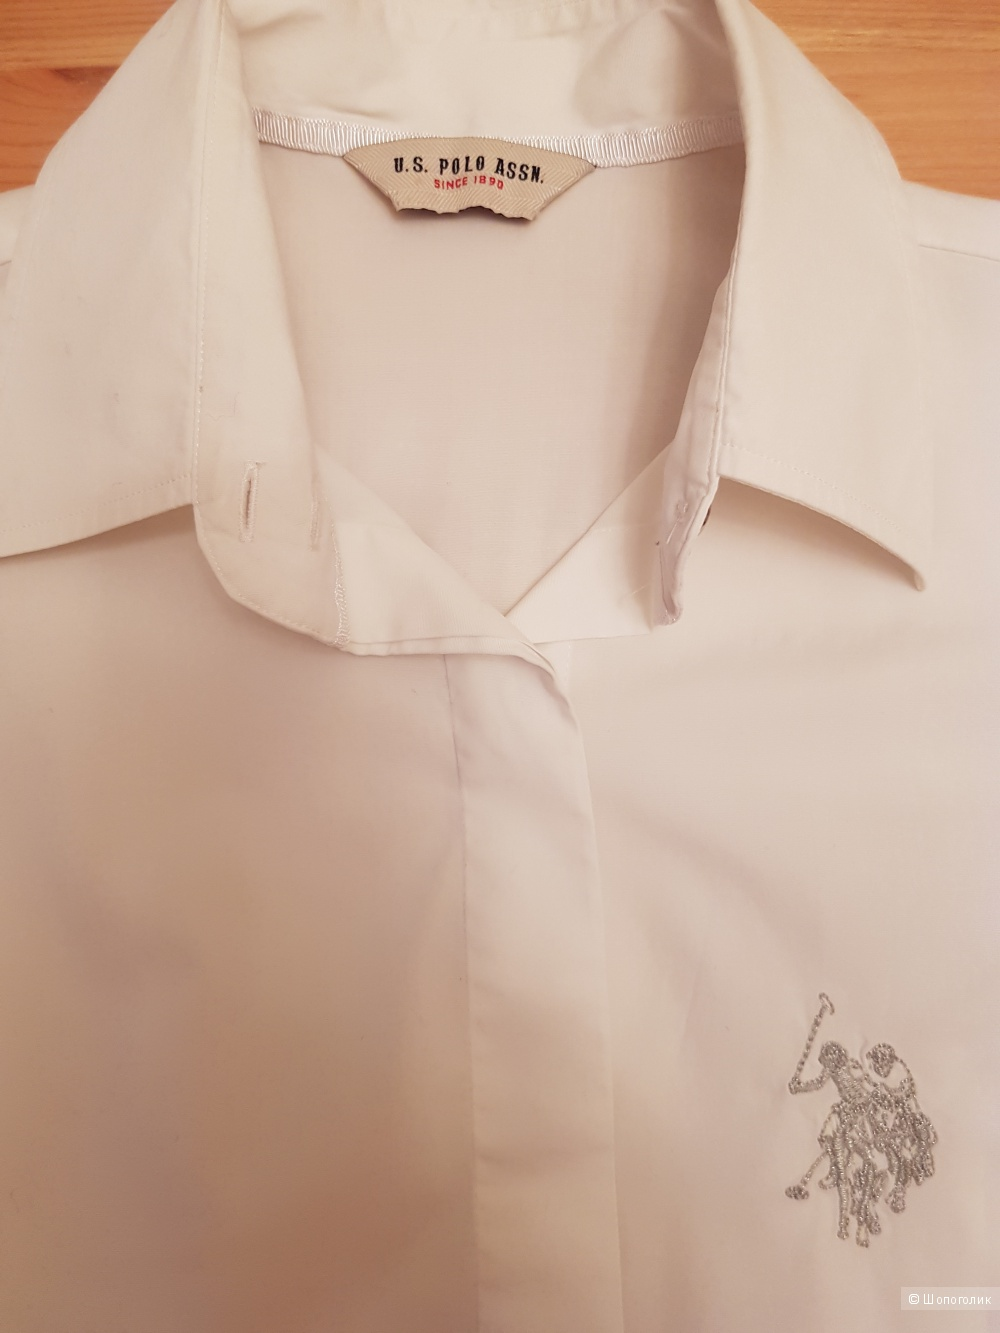 Блузка-рубашка  U.S. POLO ASSN., размер 42-44